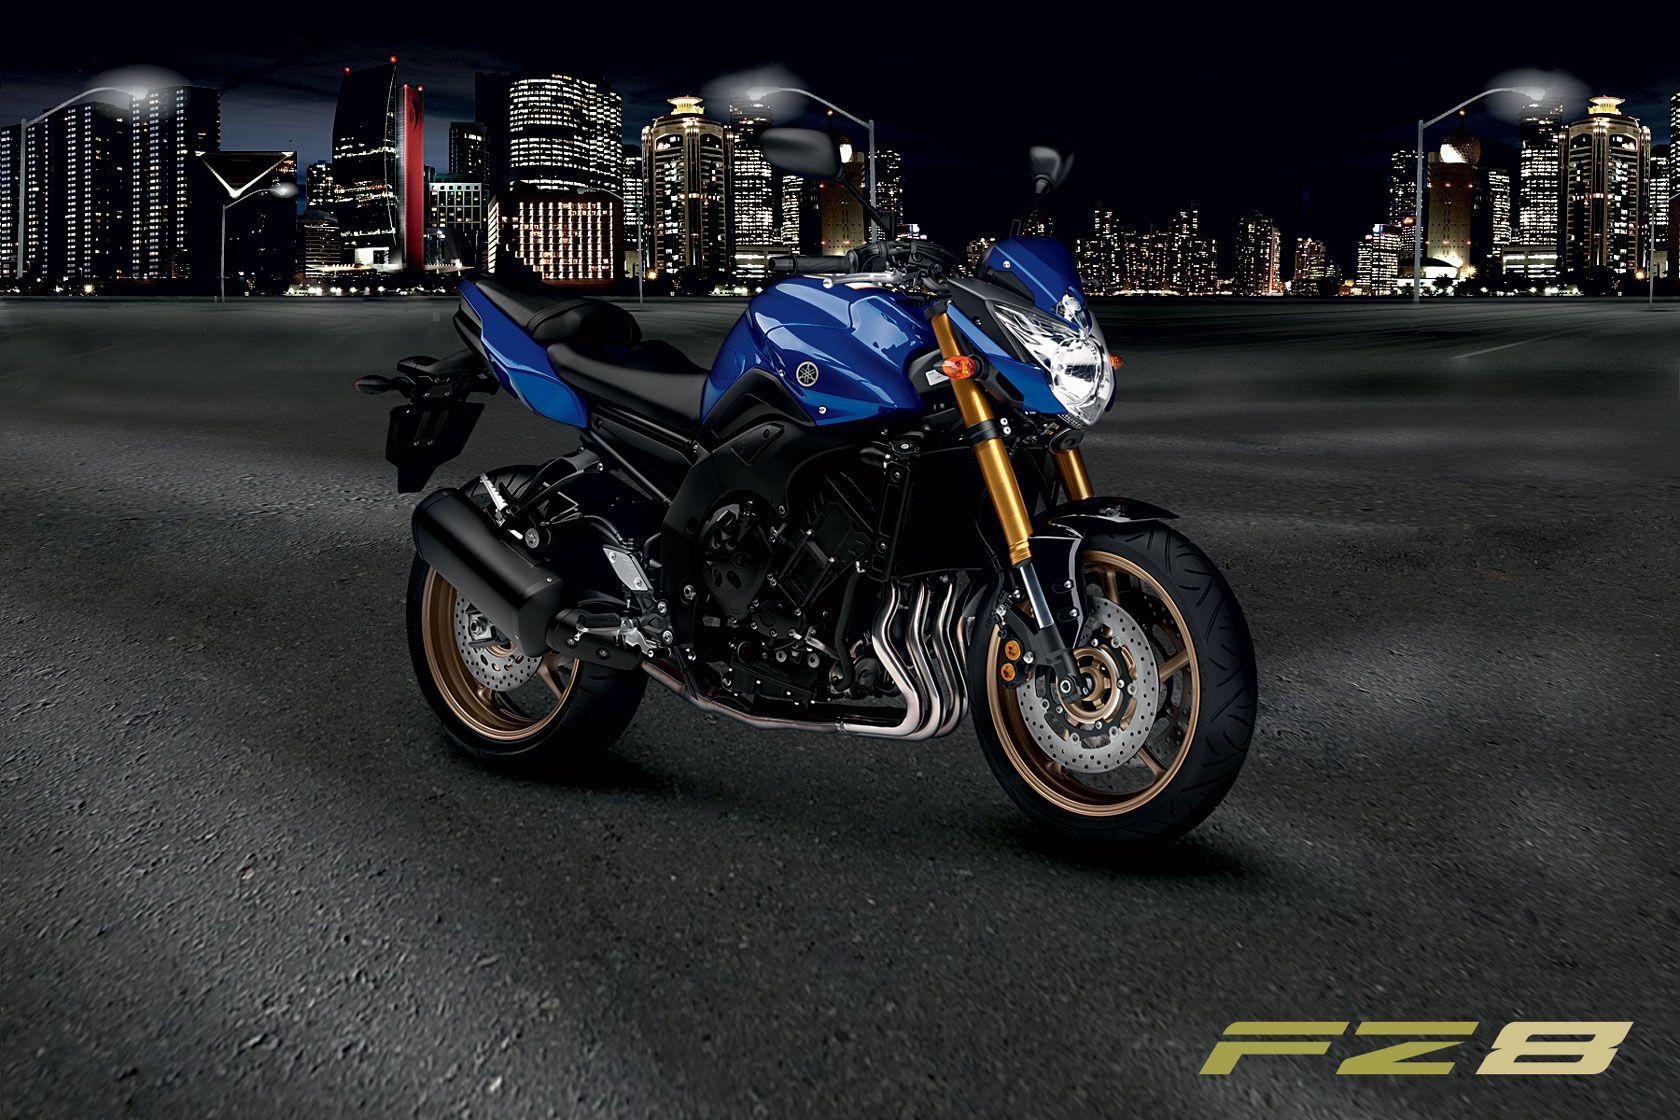 Yamaha FZ8   Google Search Yamaha FZ8 Motorcycle wallpaper 1680x1120